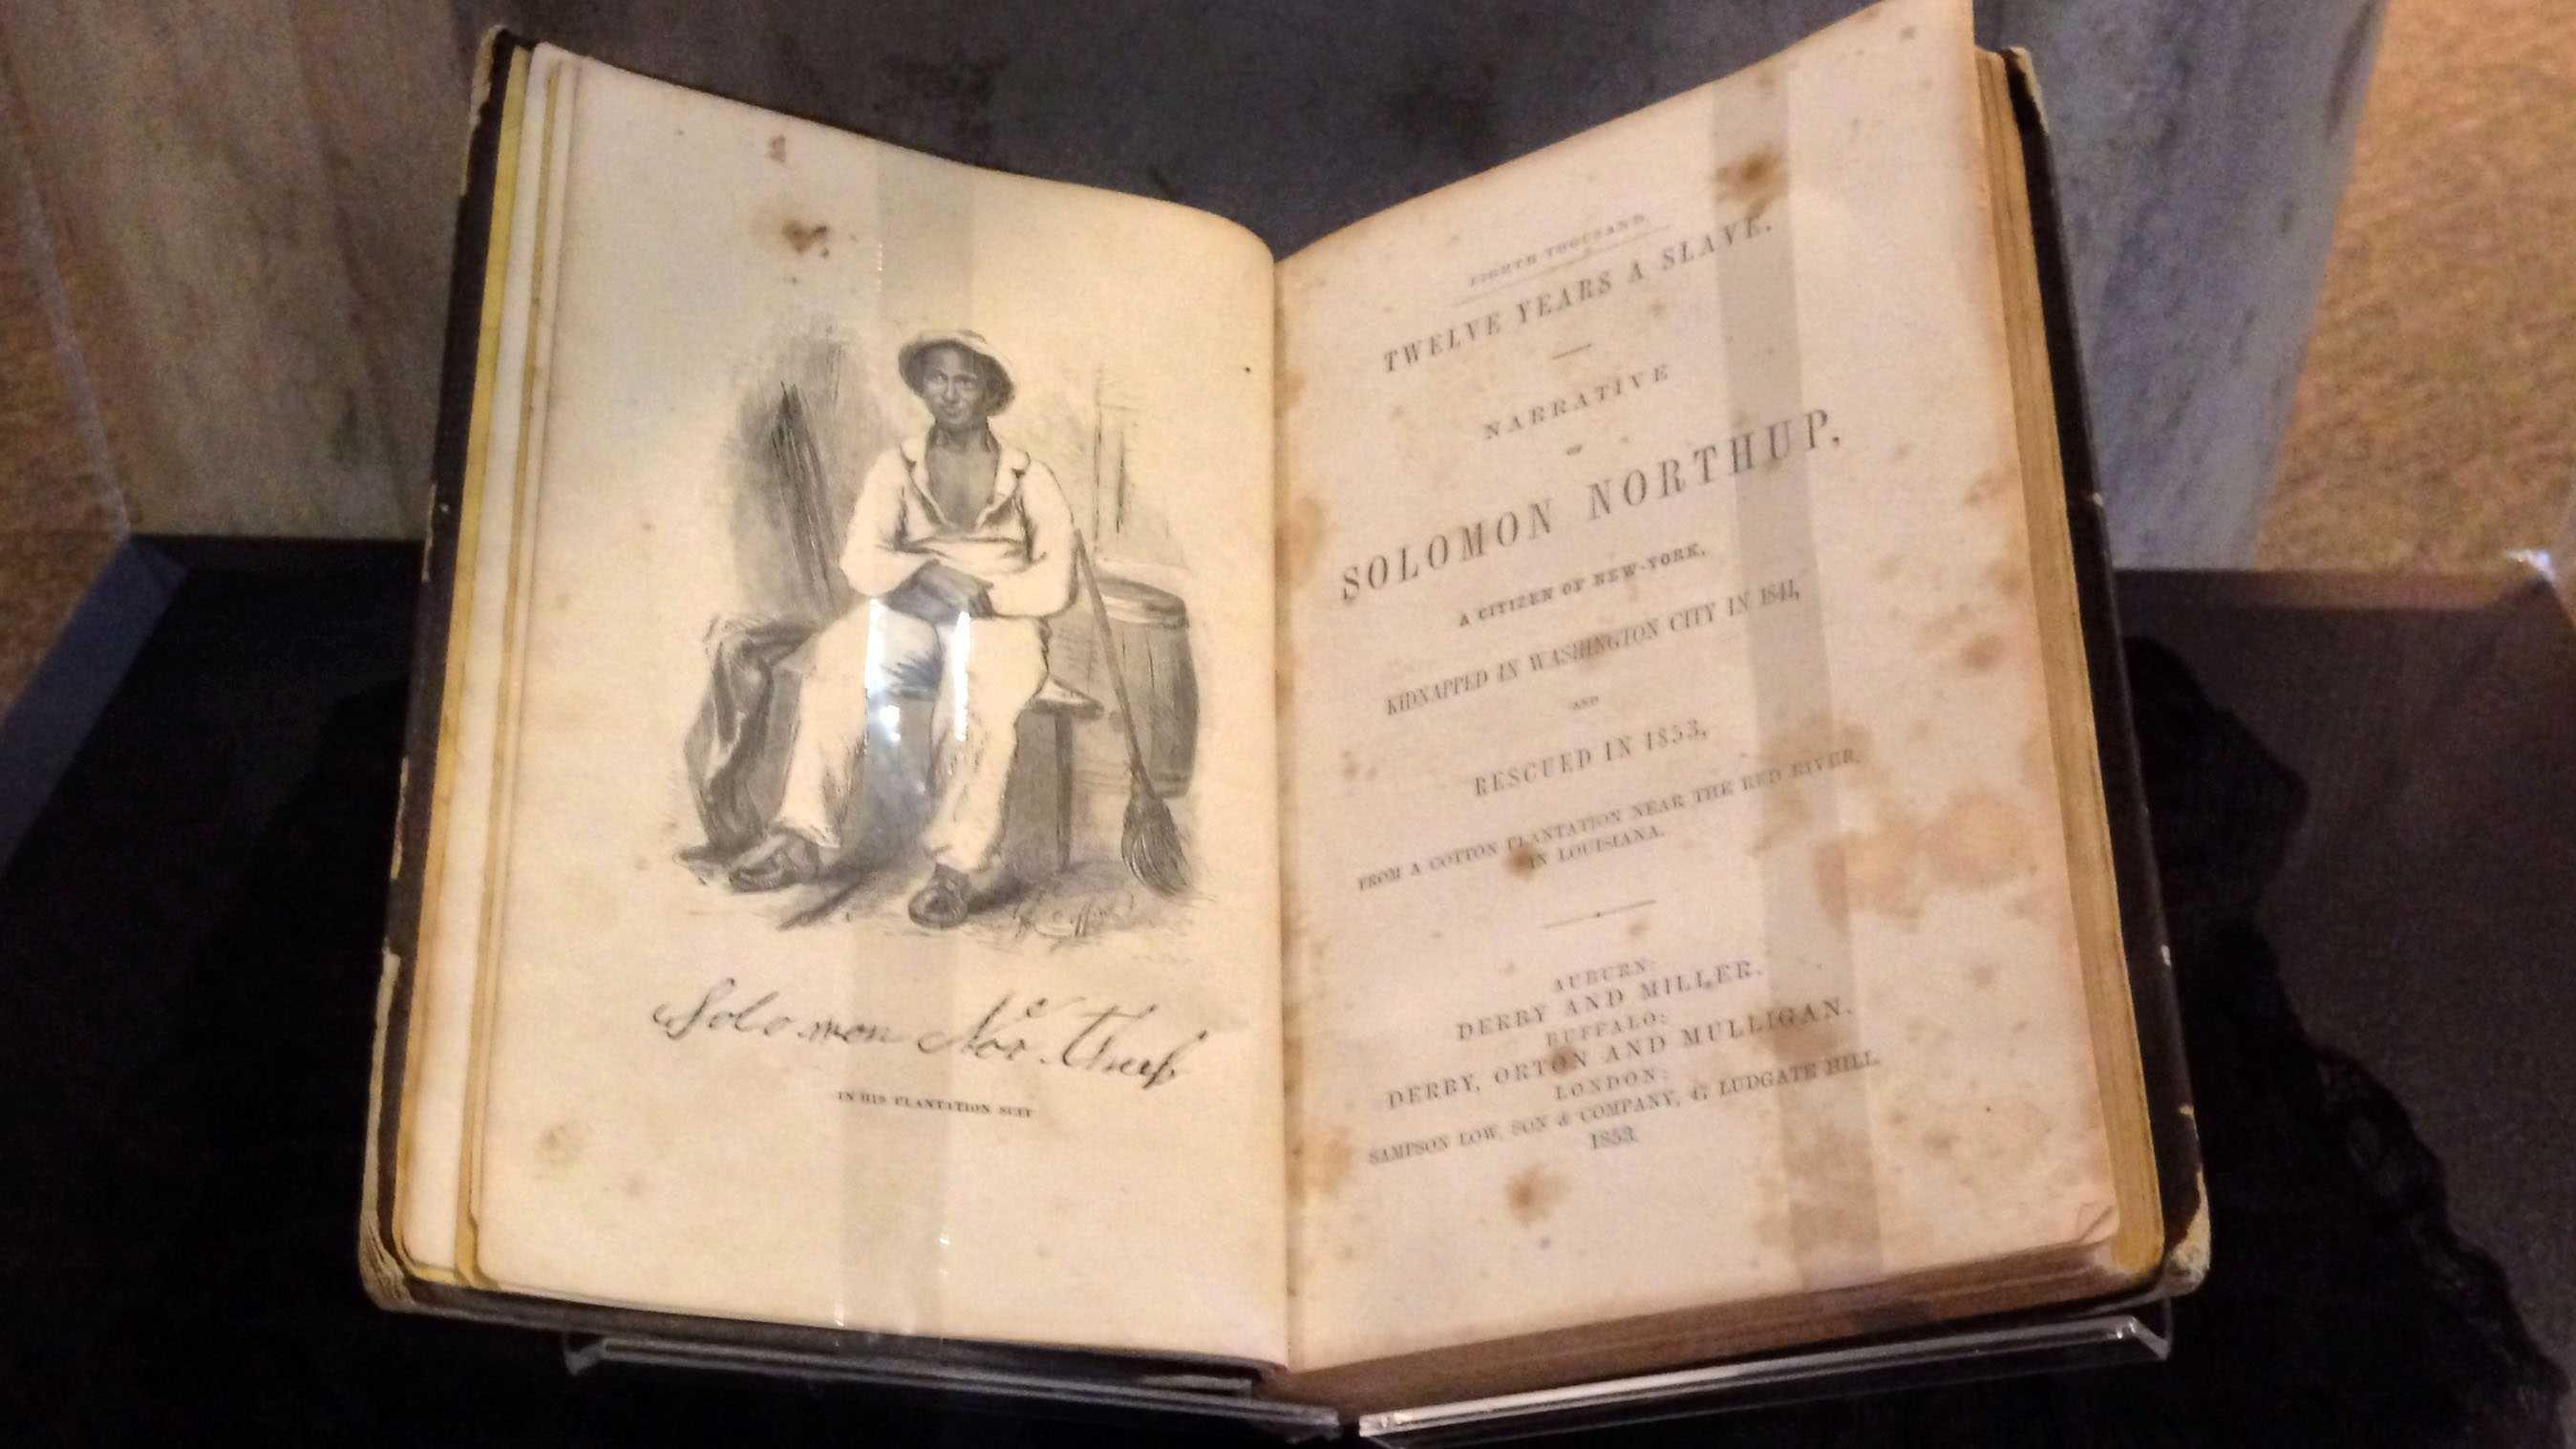 12 years a slave book.jpg